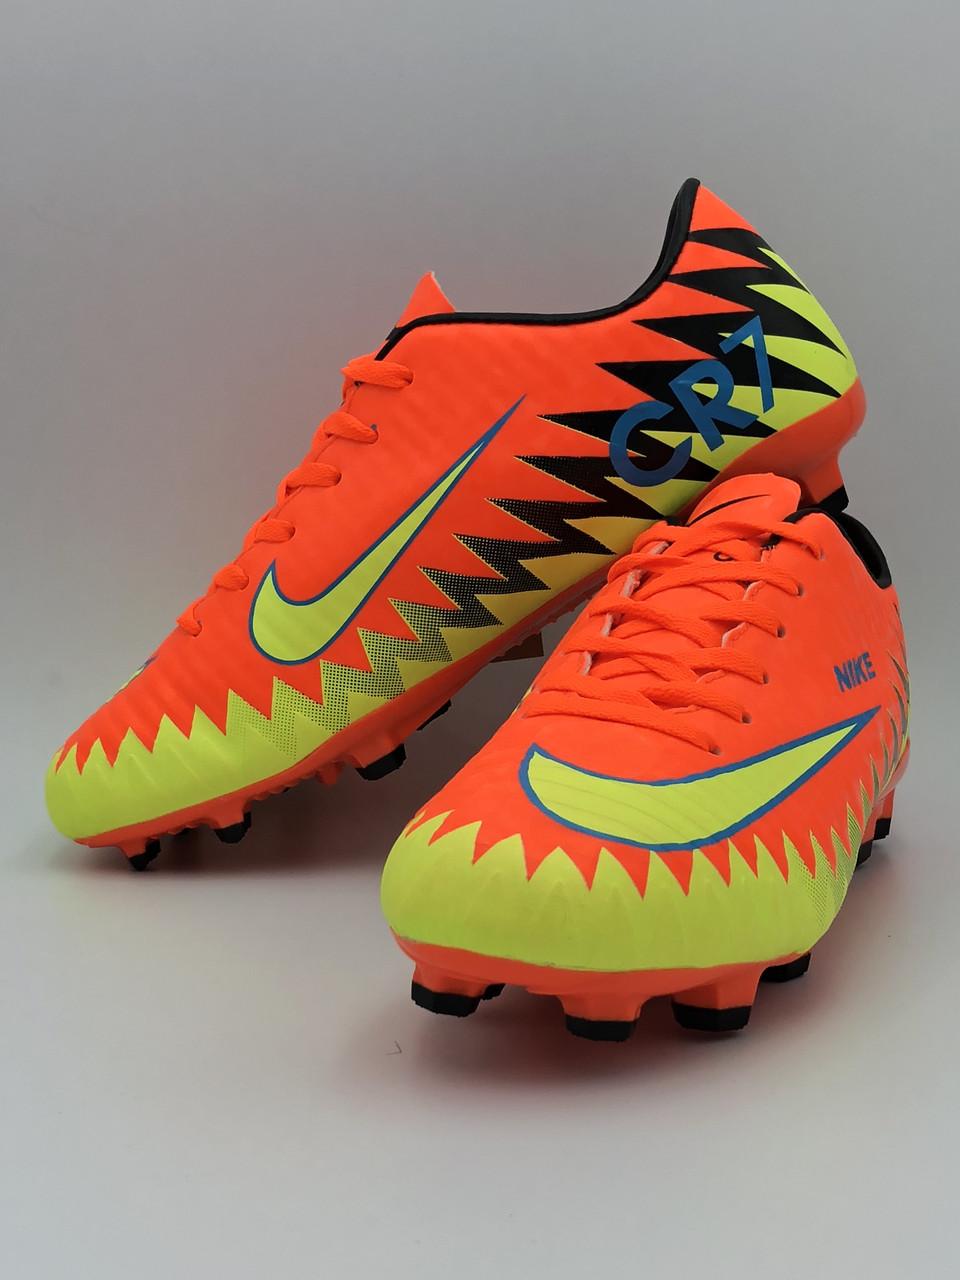 6e606255 Футбольные бутсы Nike CR7 PRO-G NEW 2018 (p.40-45) NEW!, цена 869 ...